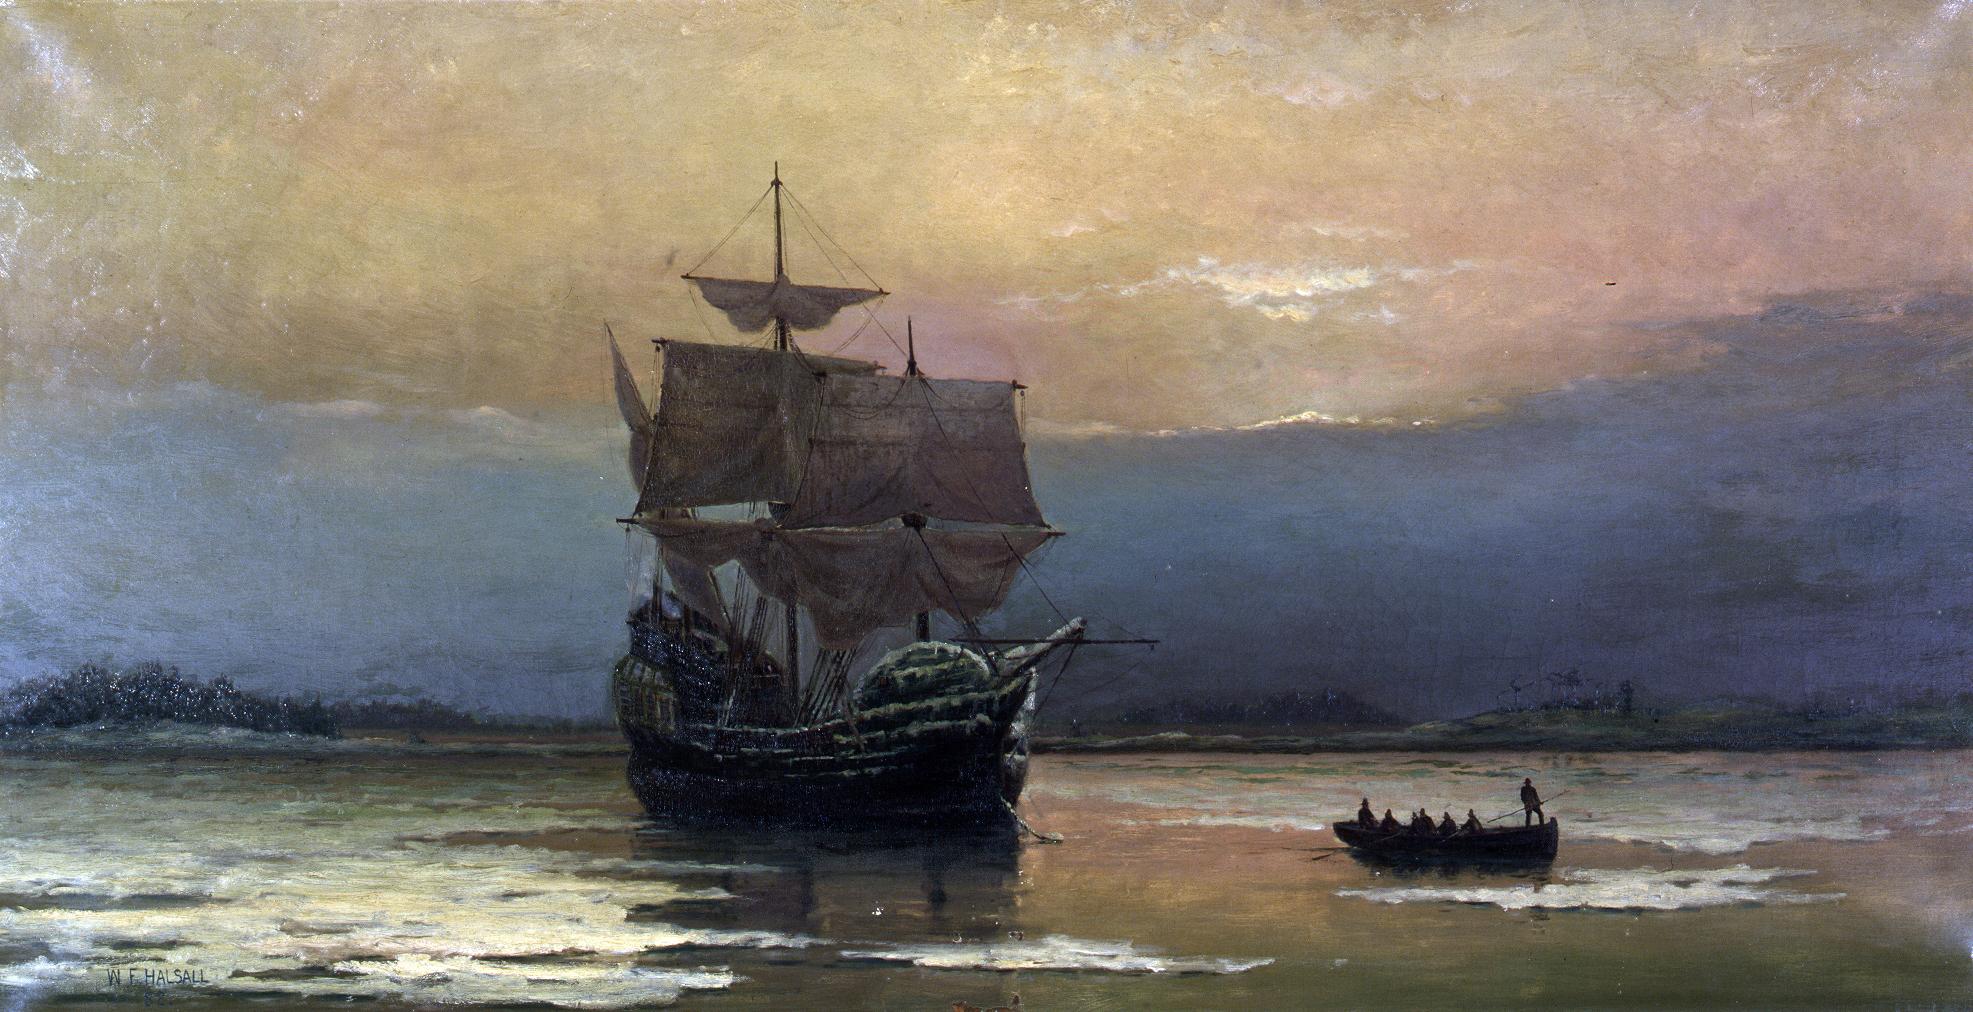 Mayflower_in_Plymouth_Harbor,_by_William_Halsall.jpg